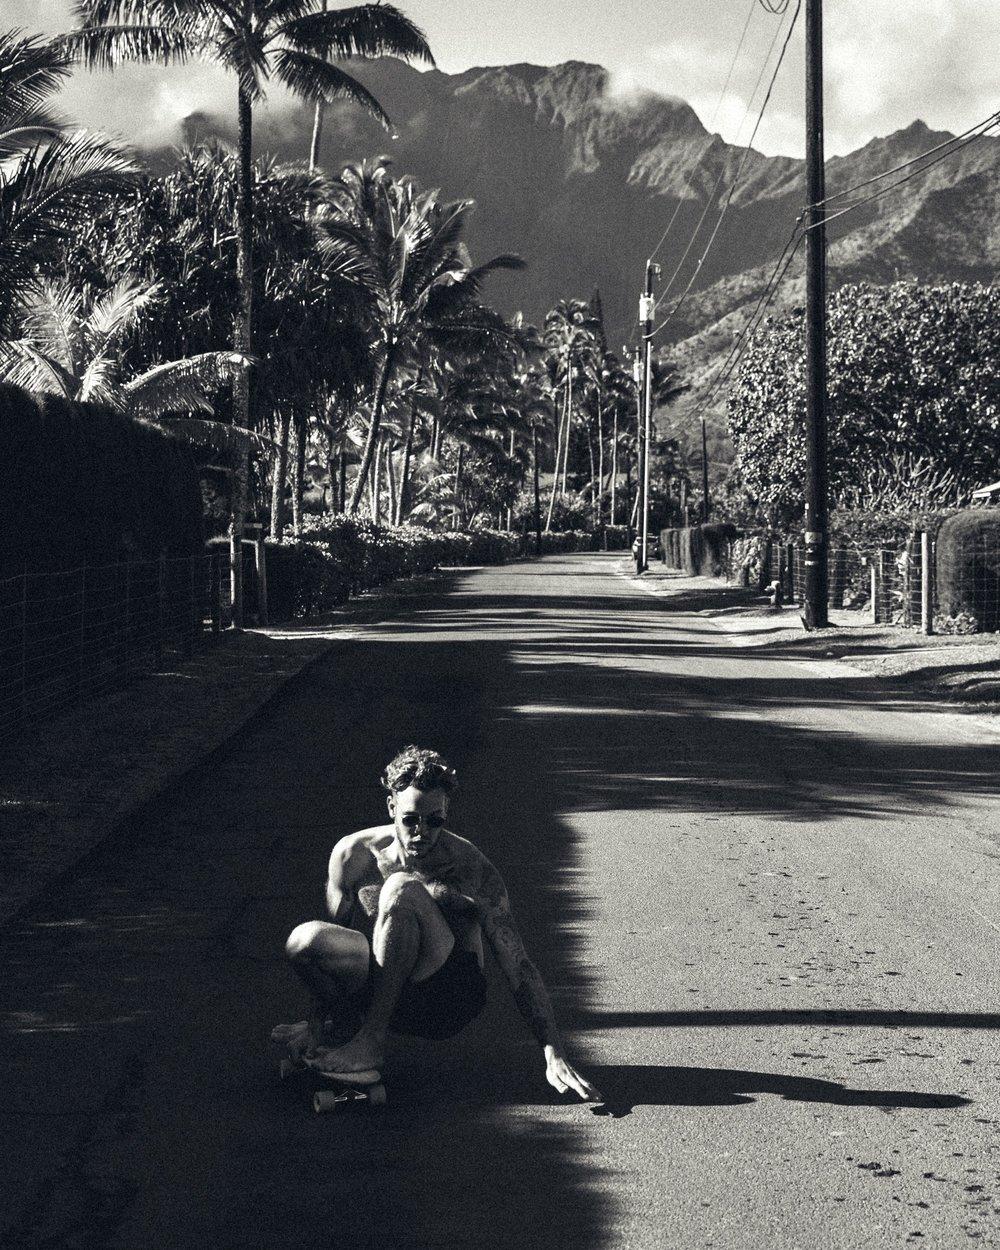 Arturo-Torres-Photographer-2018-8066.JPEG